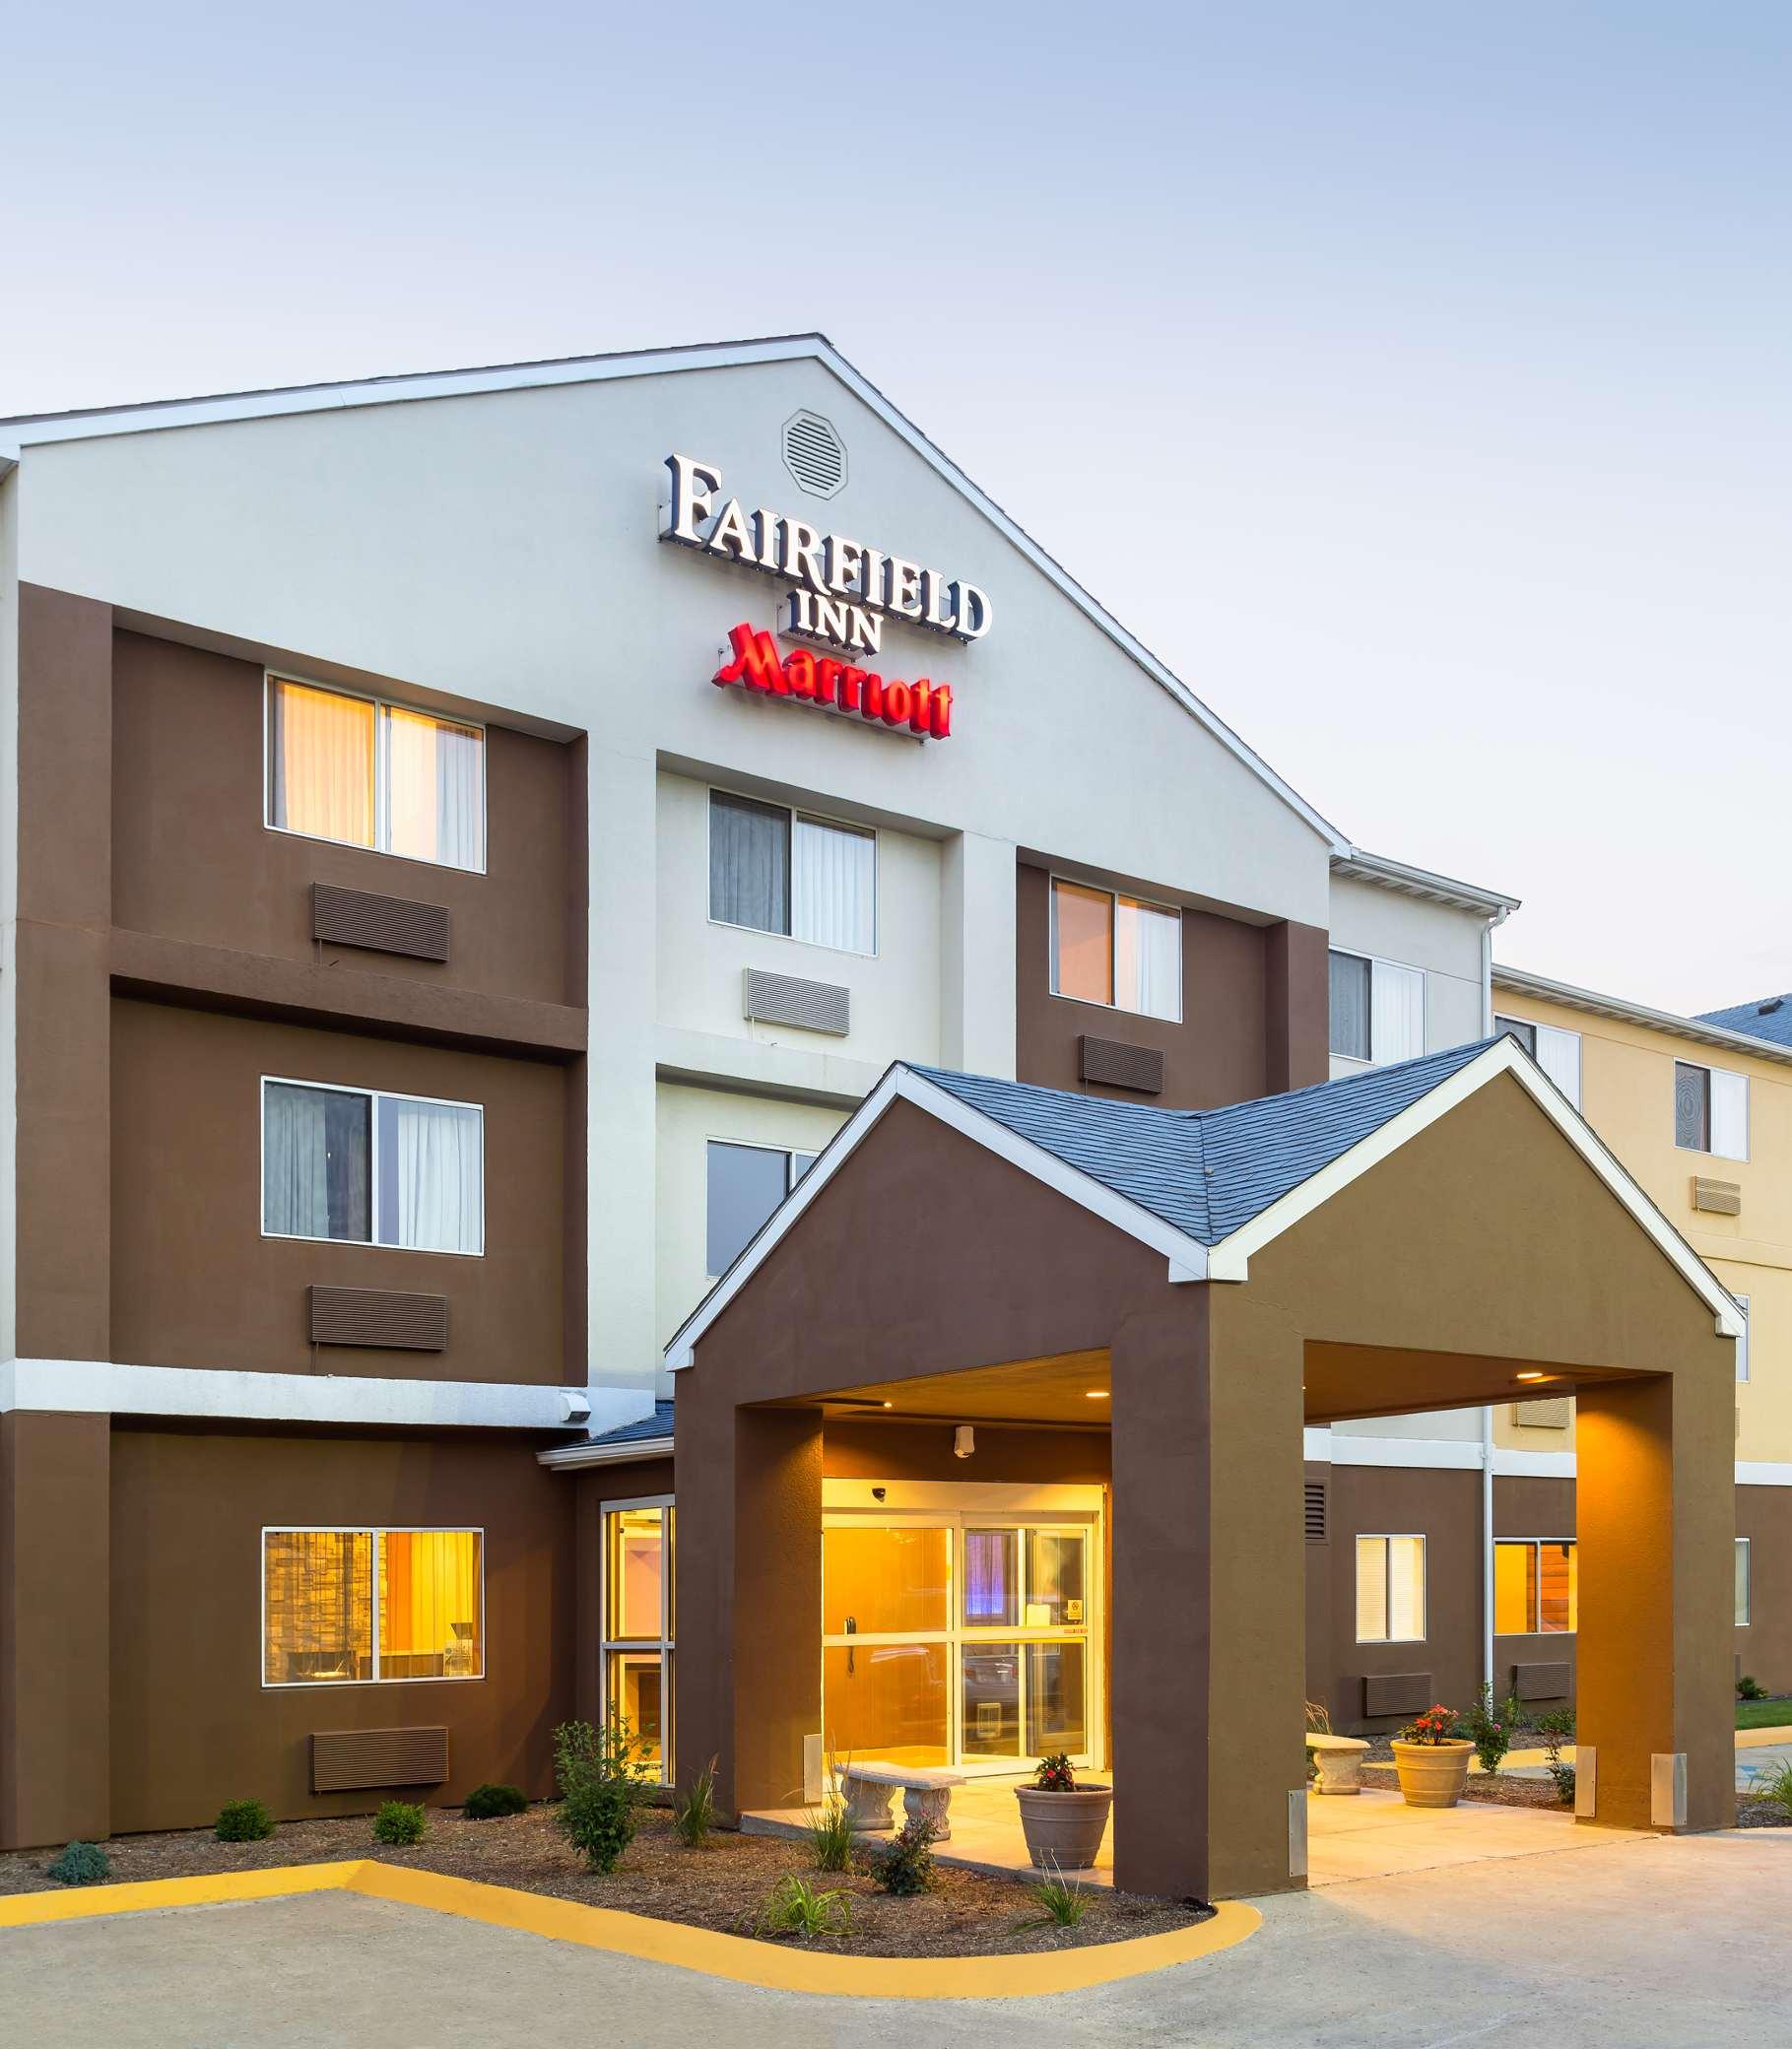 Fairfield Inn & Suites by Marriott Lafayette image 11